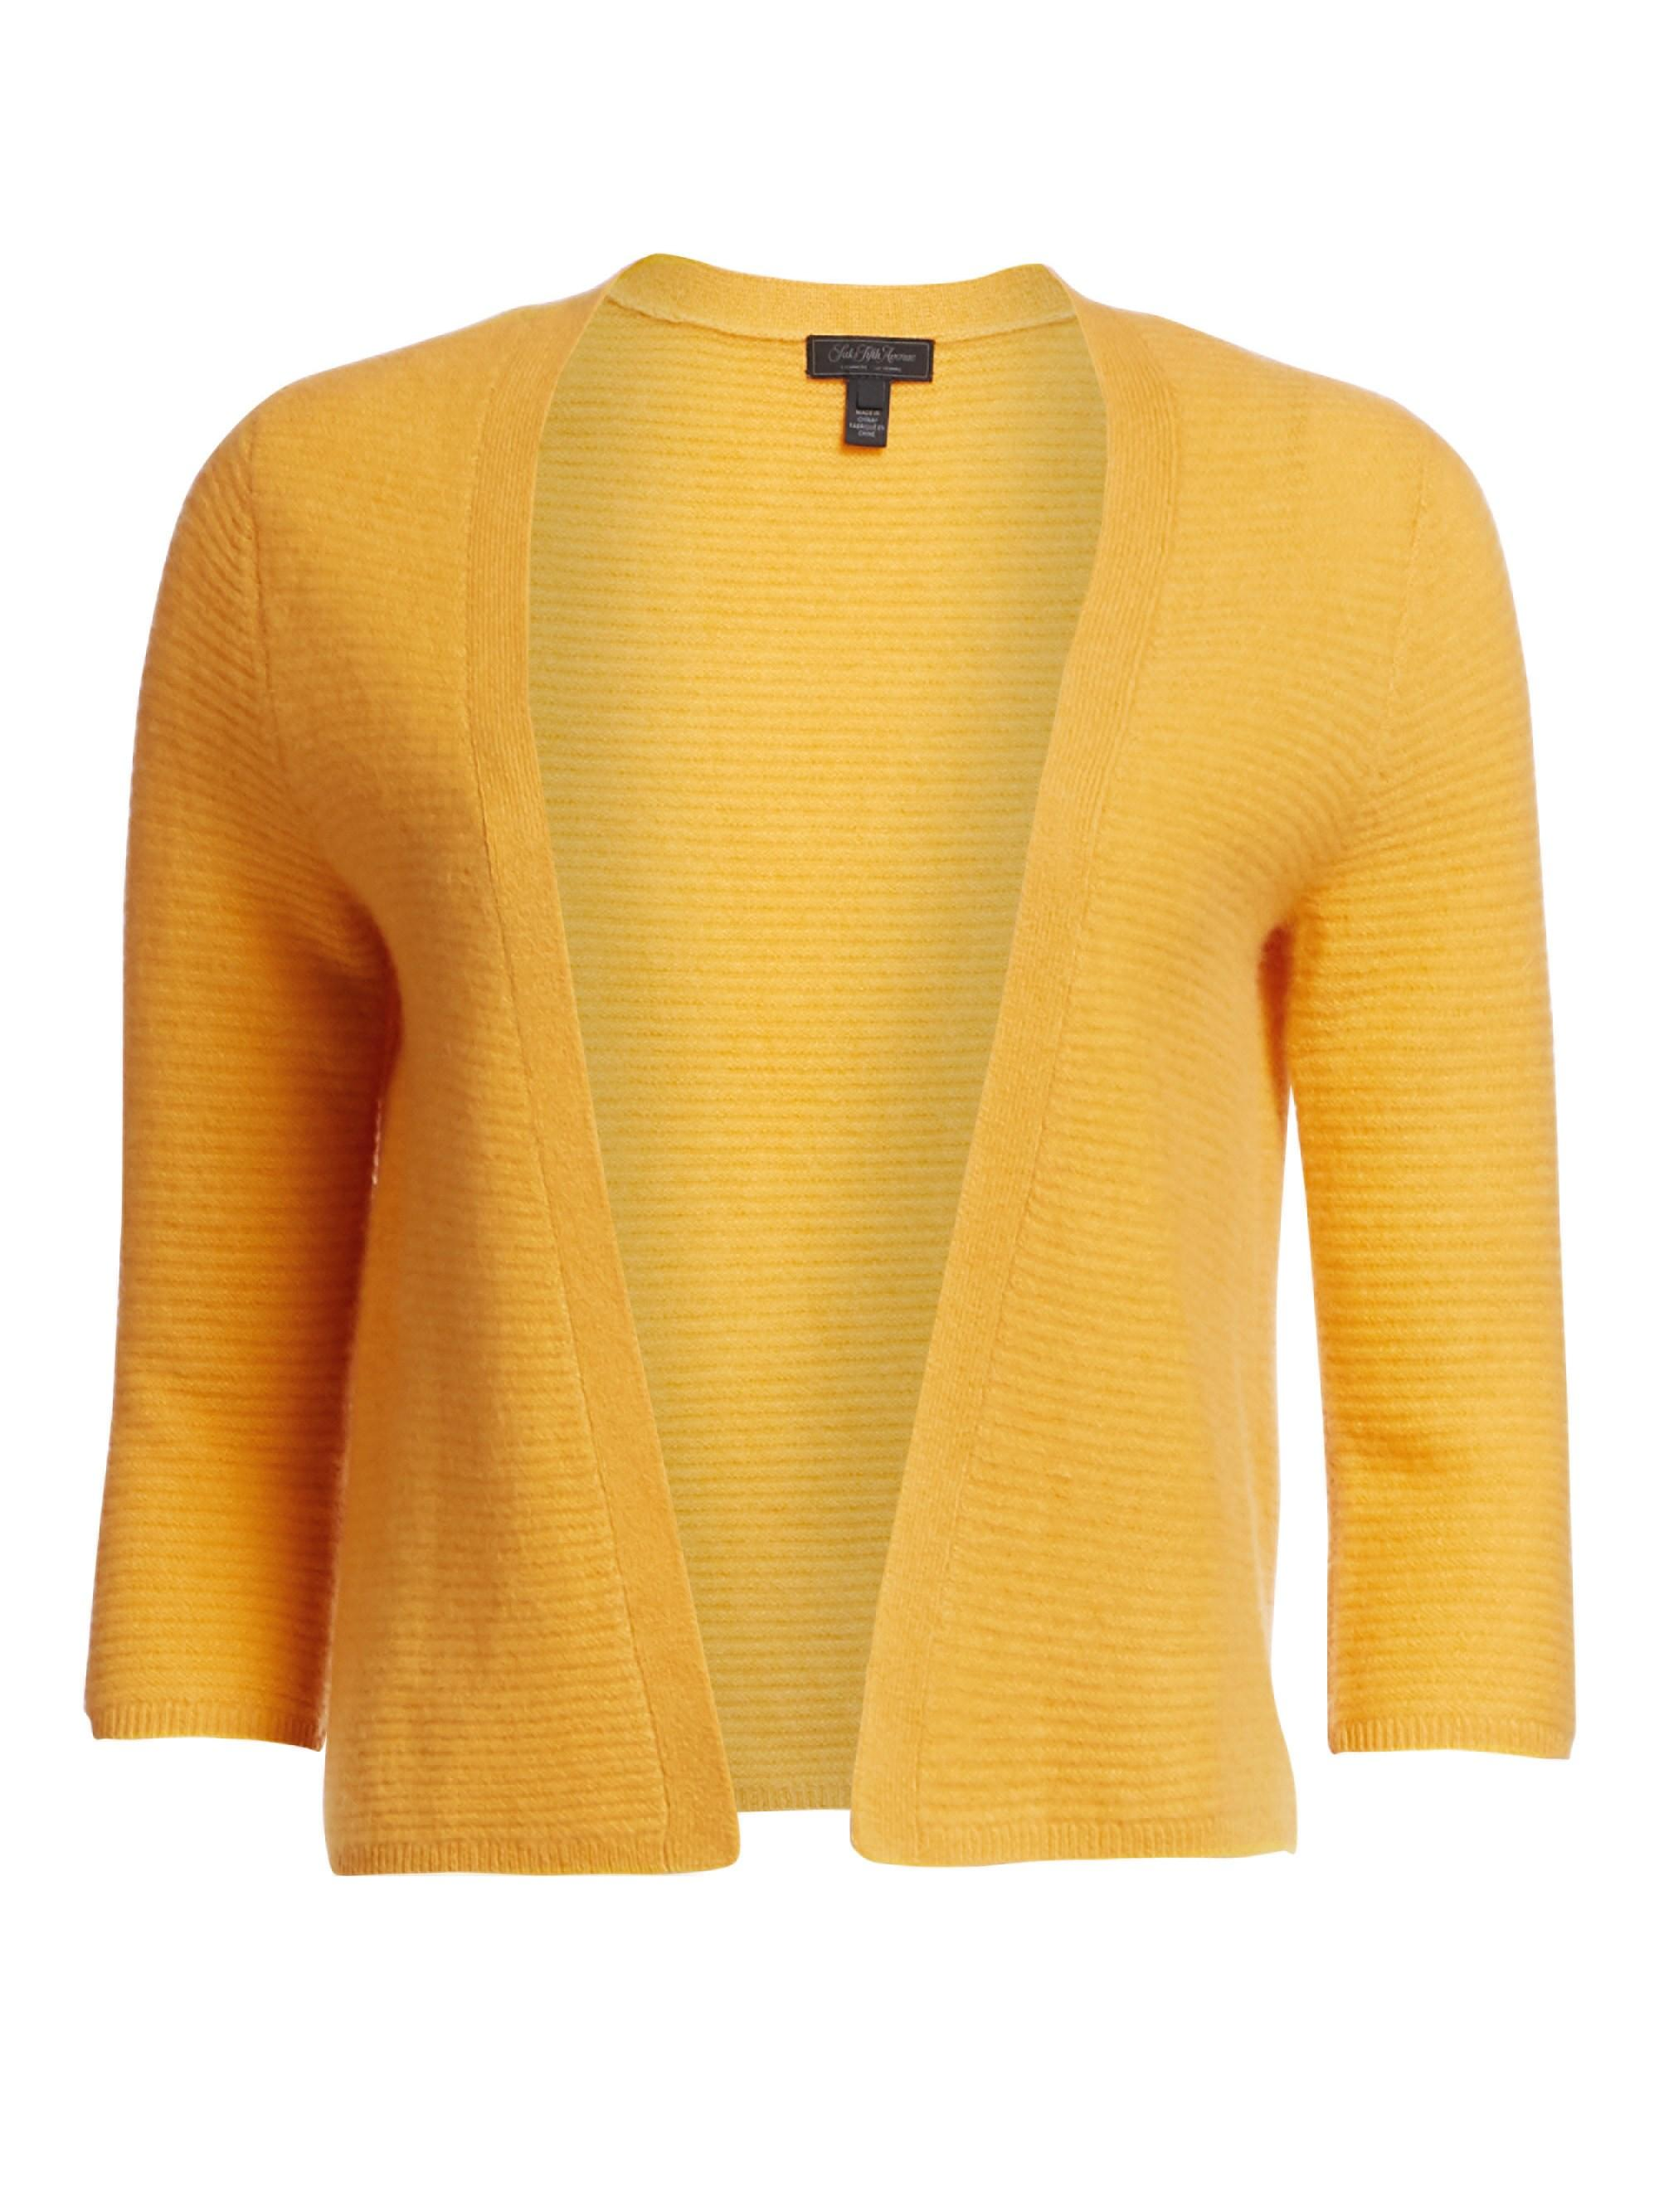 67ff751b17 Saks Fifth Avenue. Yellow Women s Link Stitch Cashmere Cardigan ...